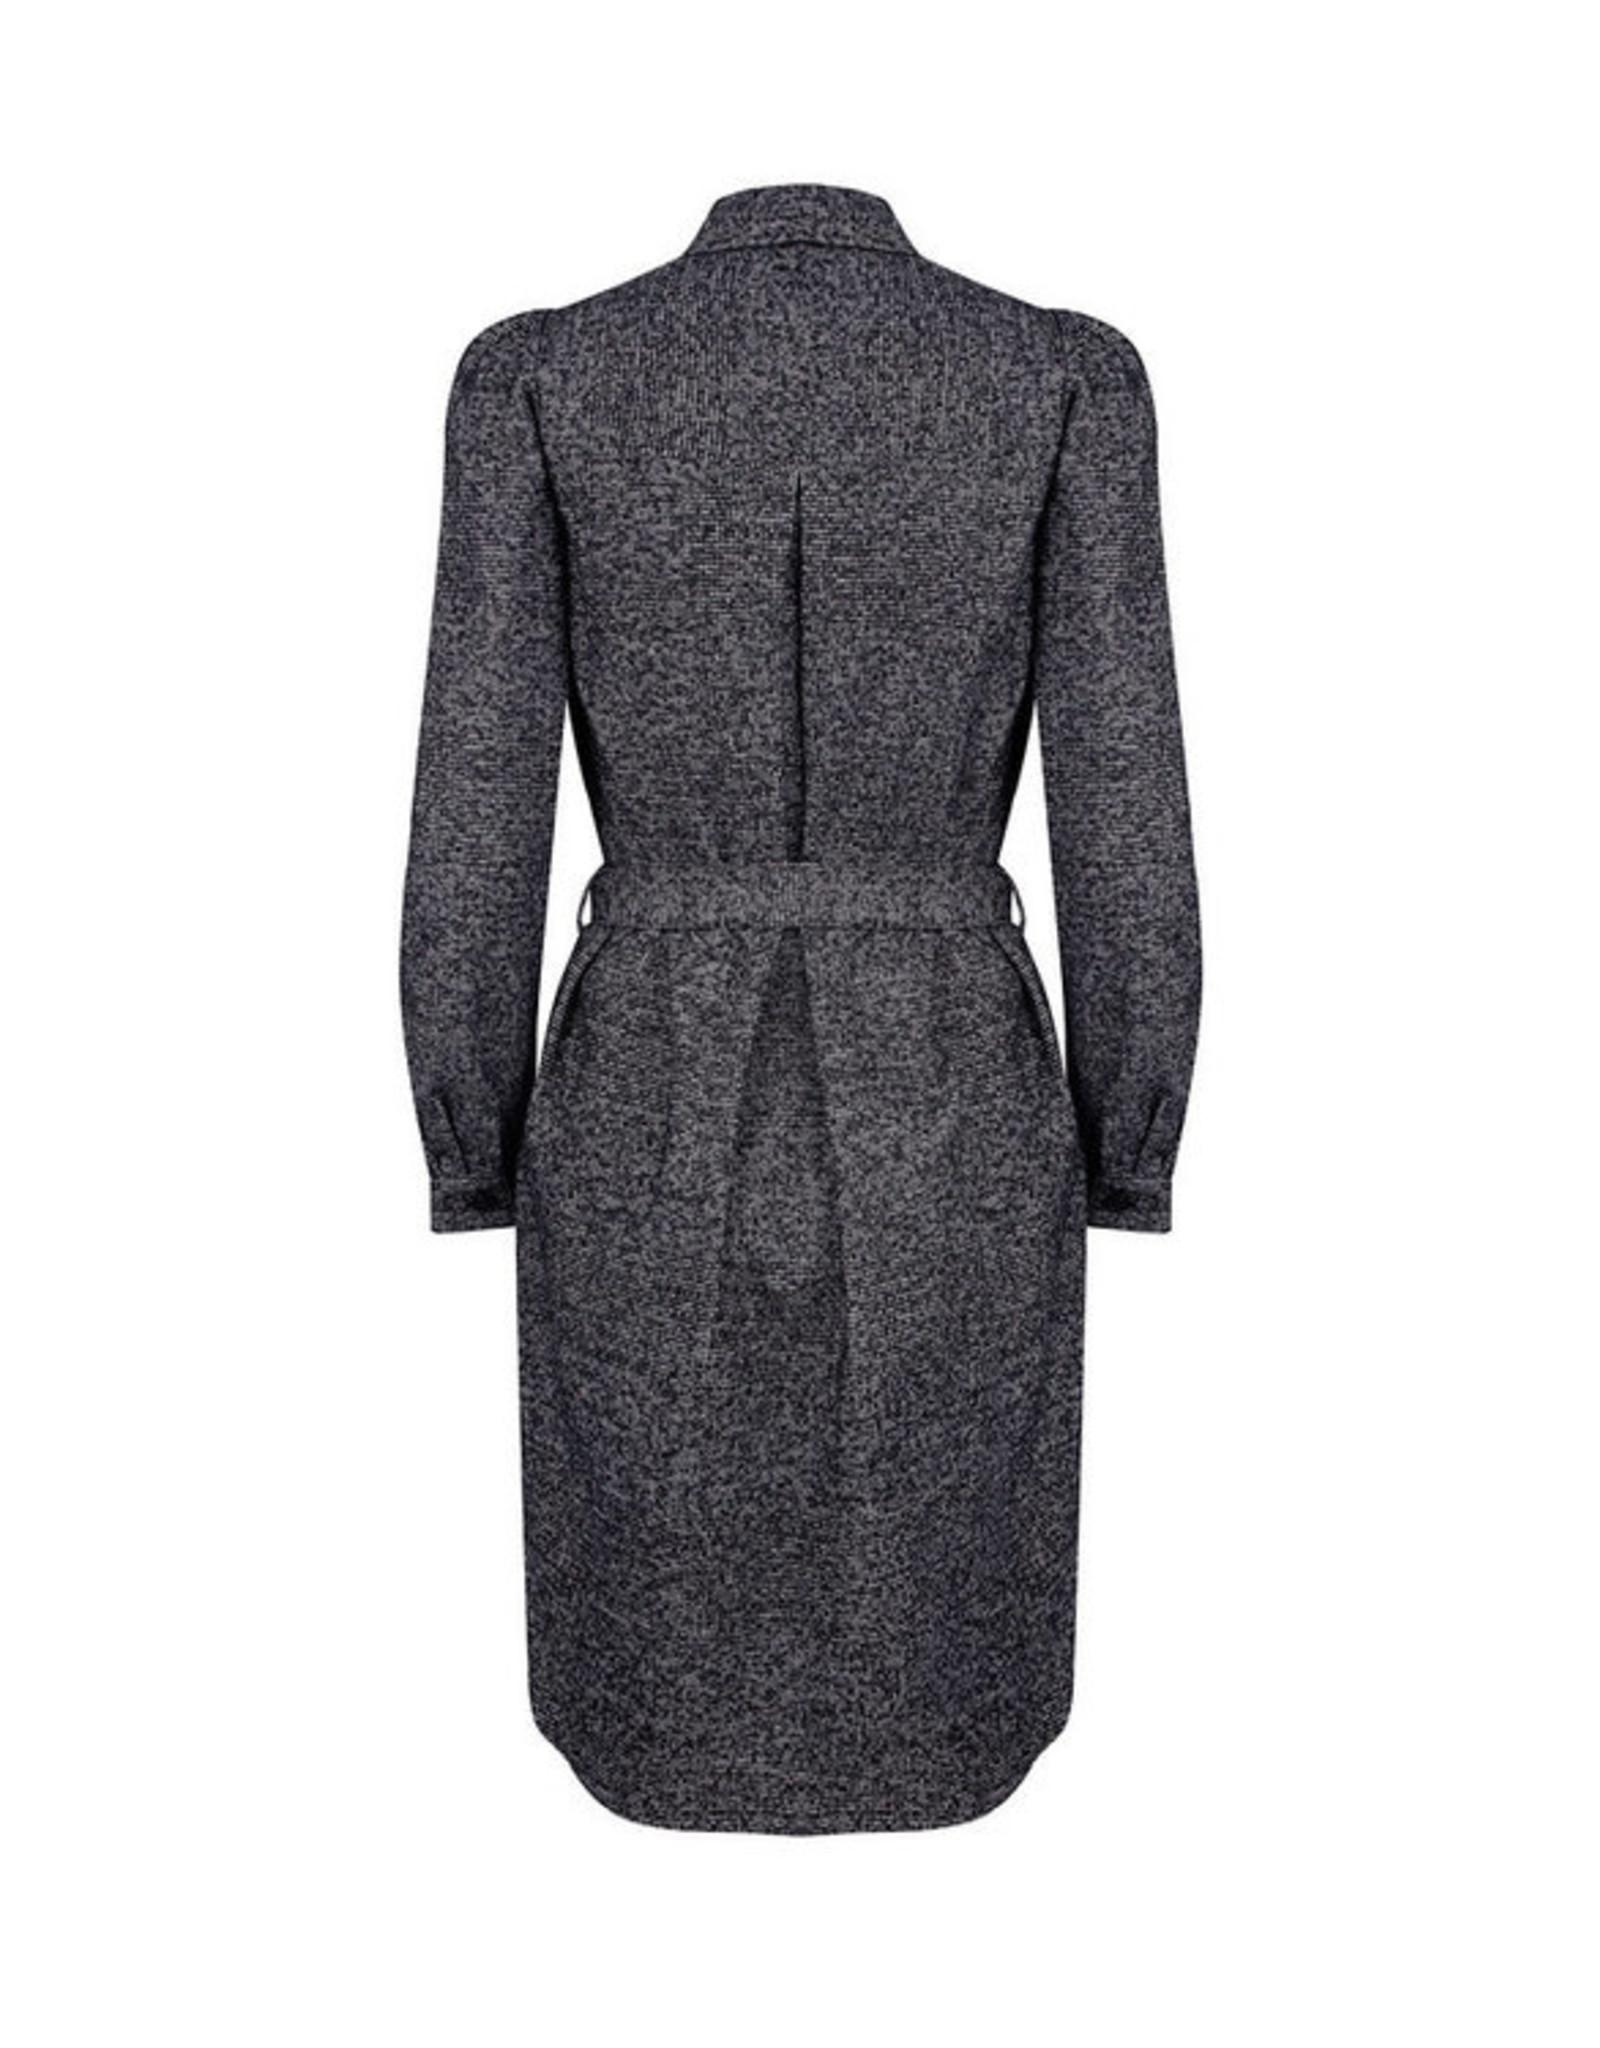 Ruby Tuesday Maelis long woolen shirt dress black